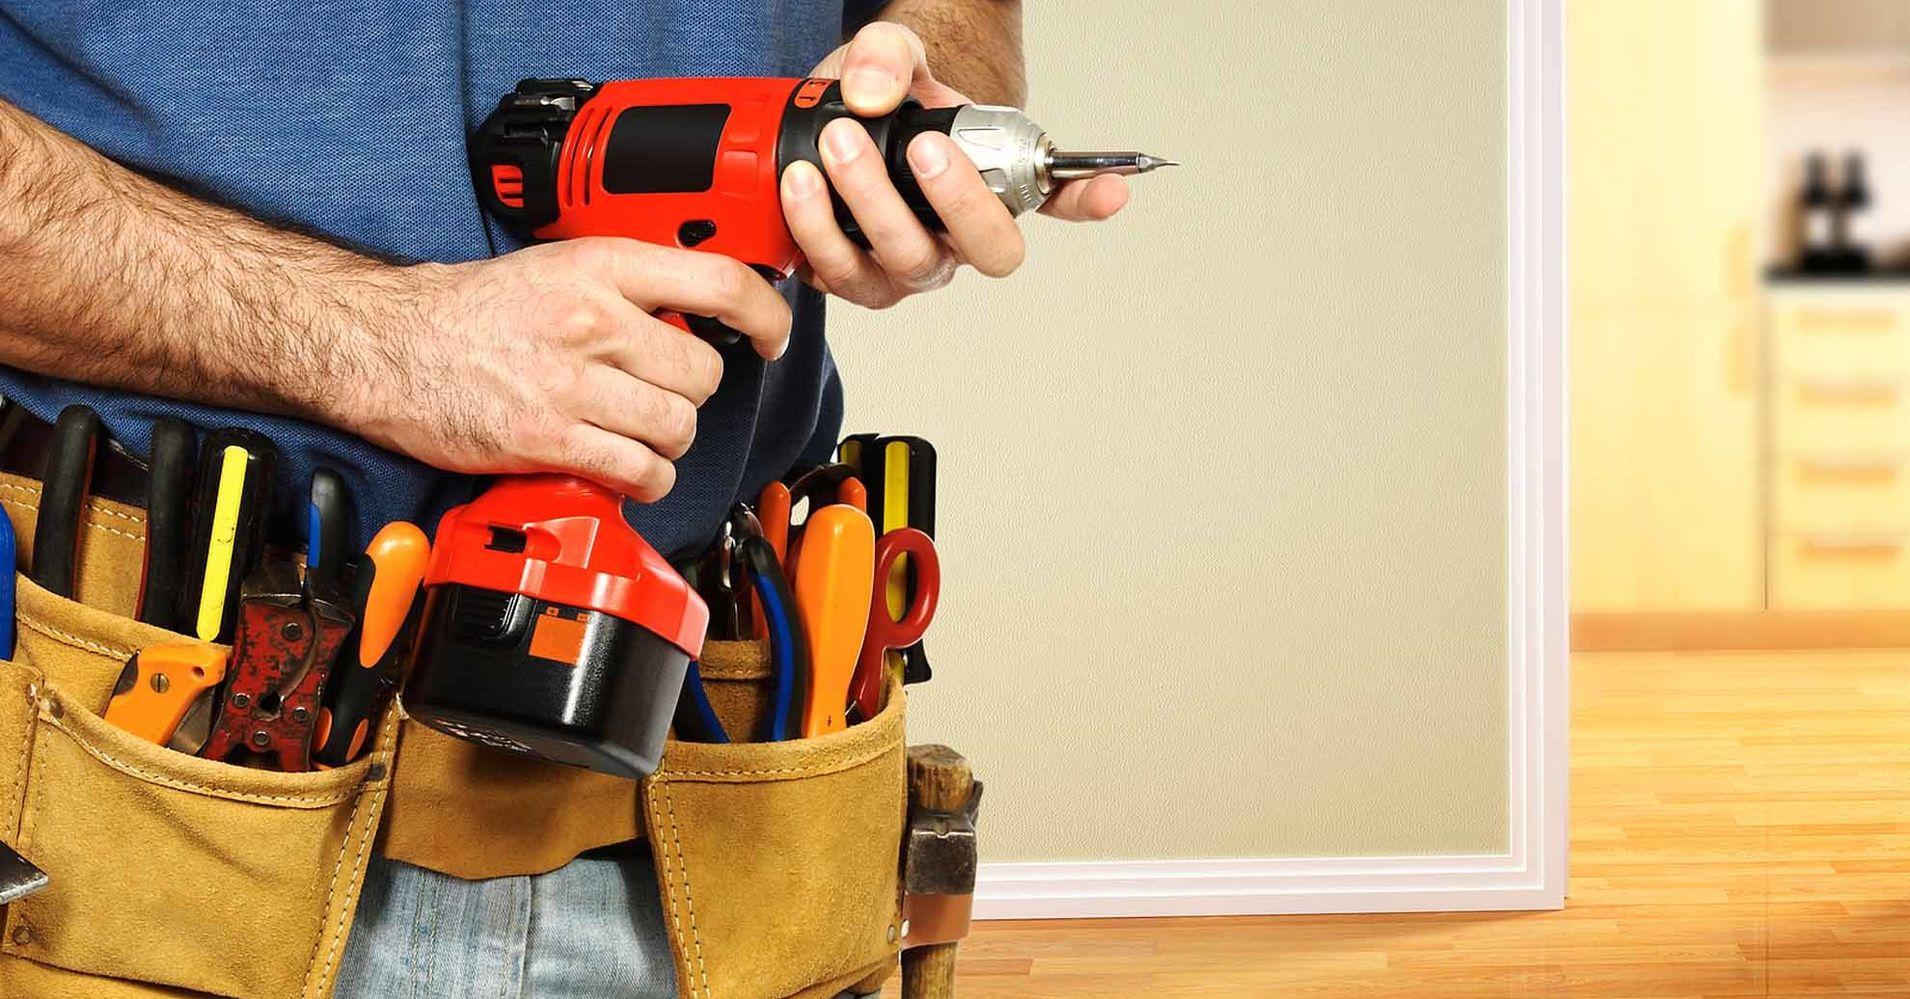 Free handyman price list - Free Handyman Price List 56